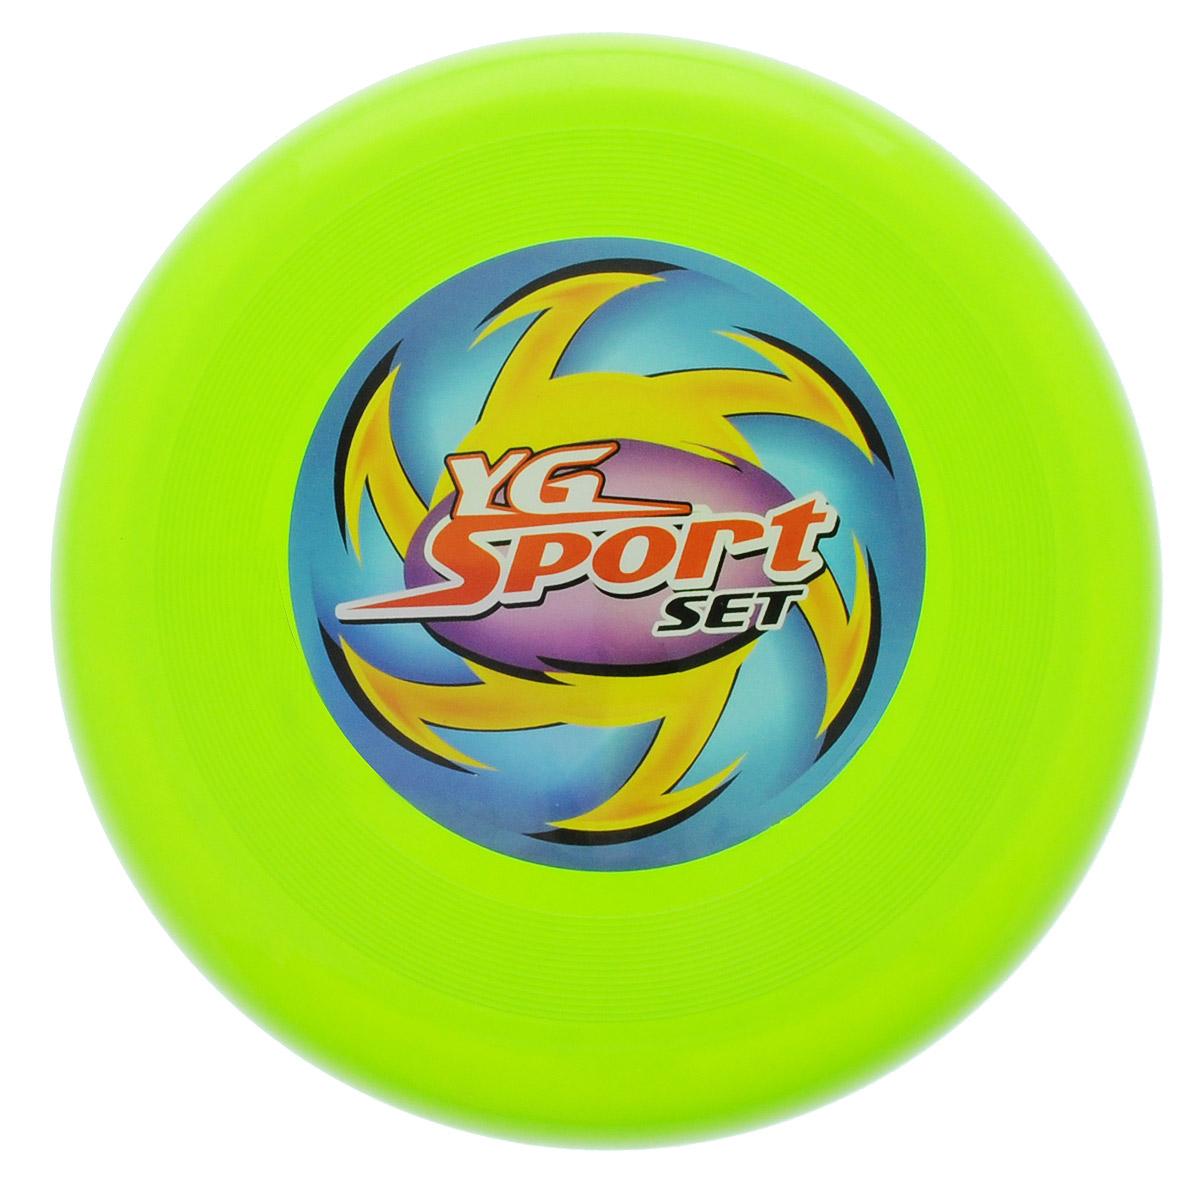 YG Sport Летающий диск цвет салатовый